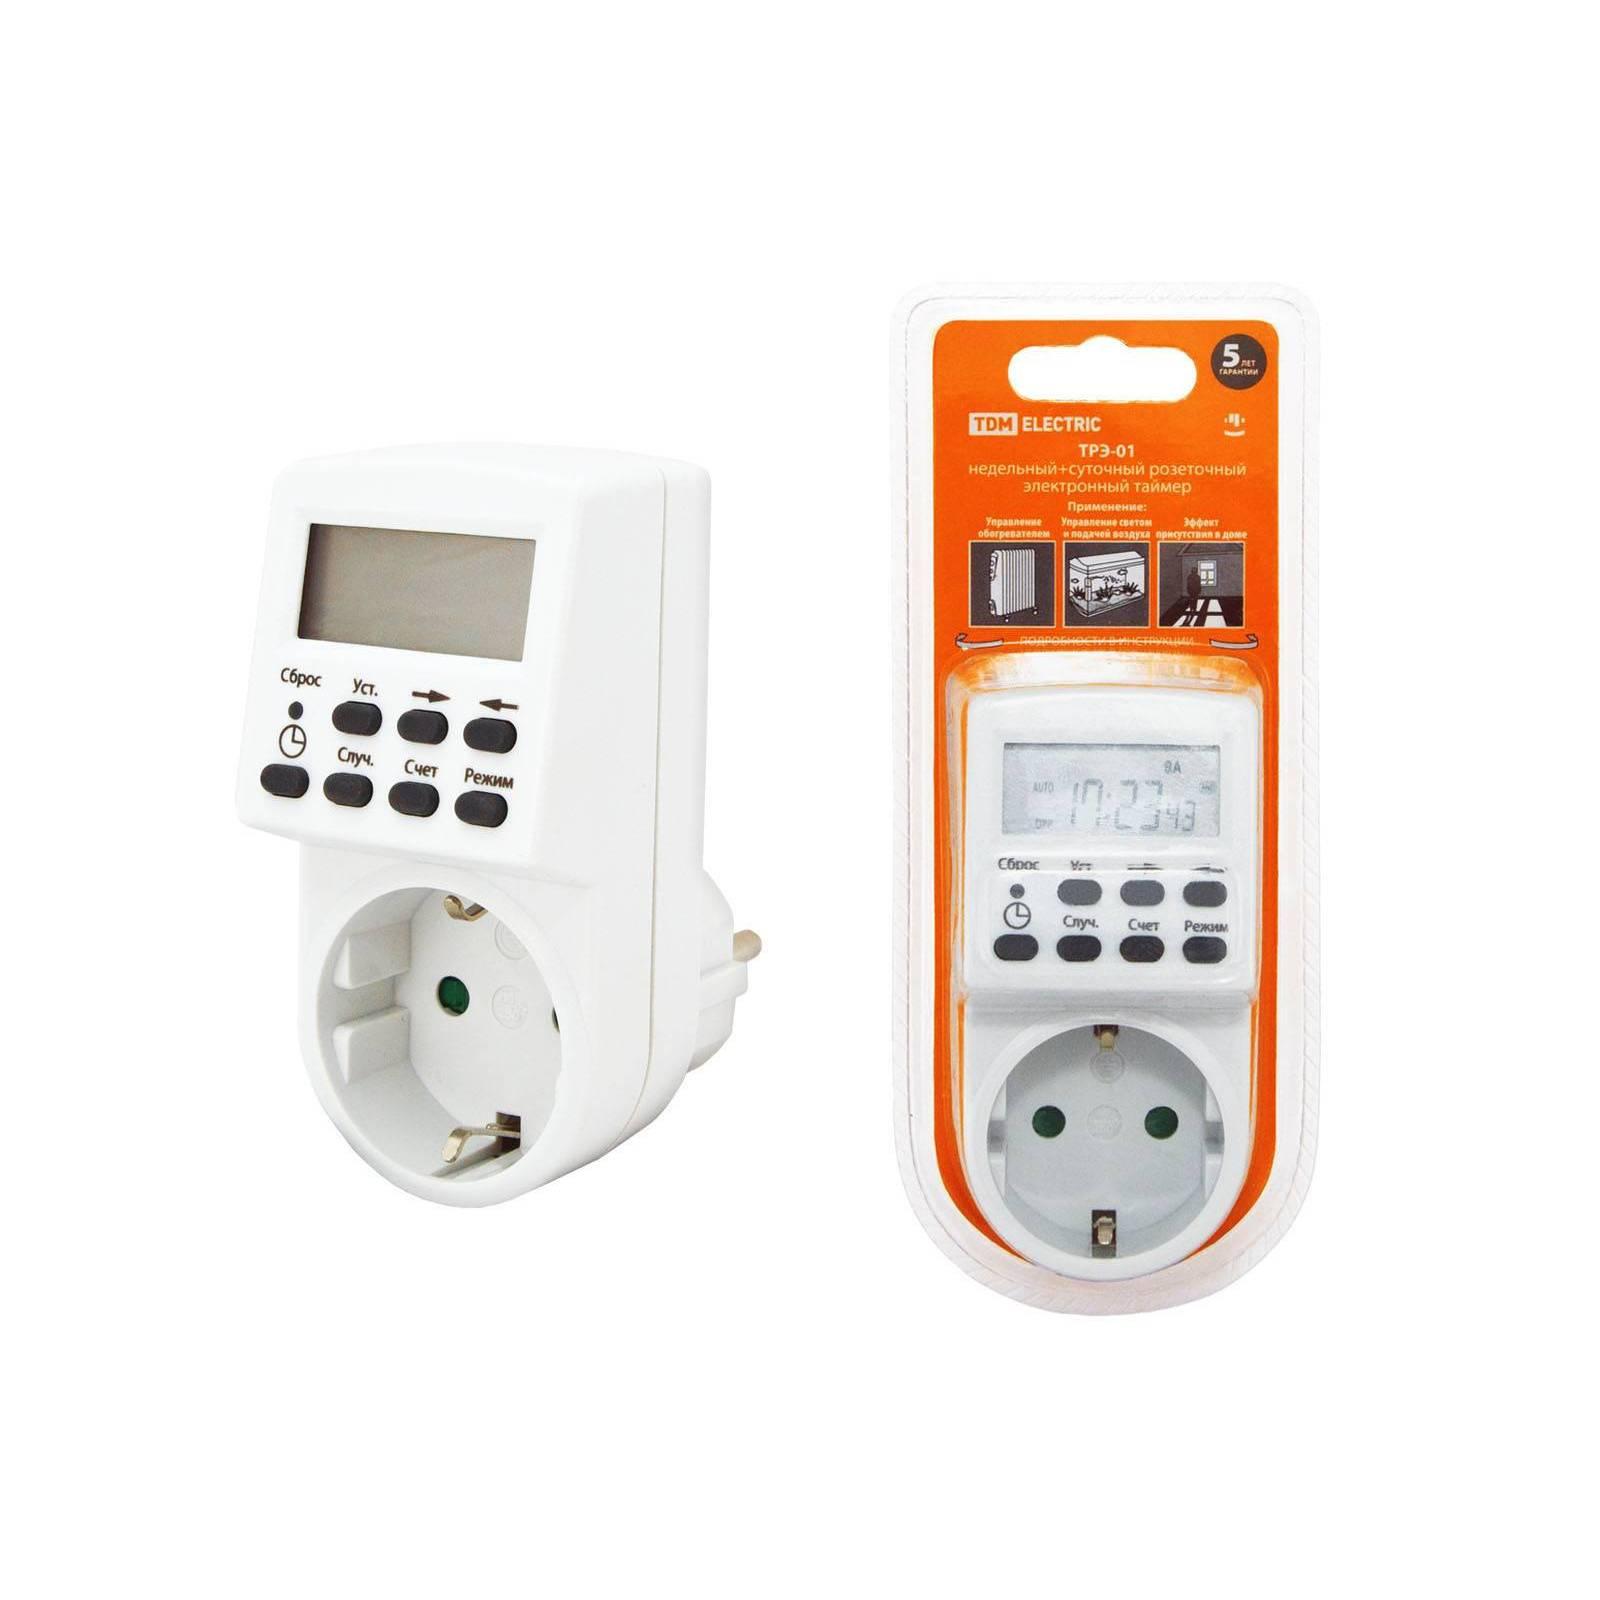 Outlet timer трэ-01-1мин/7дн-20on/off-16a TDM sq1506-0002